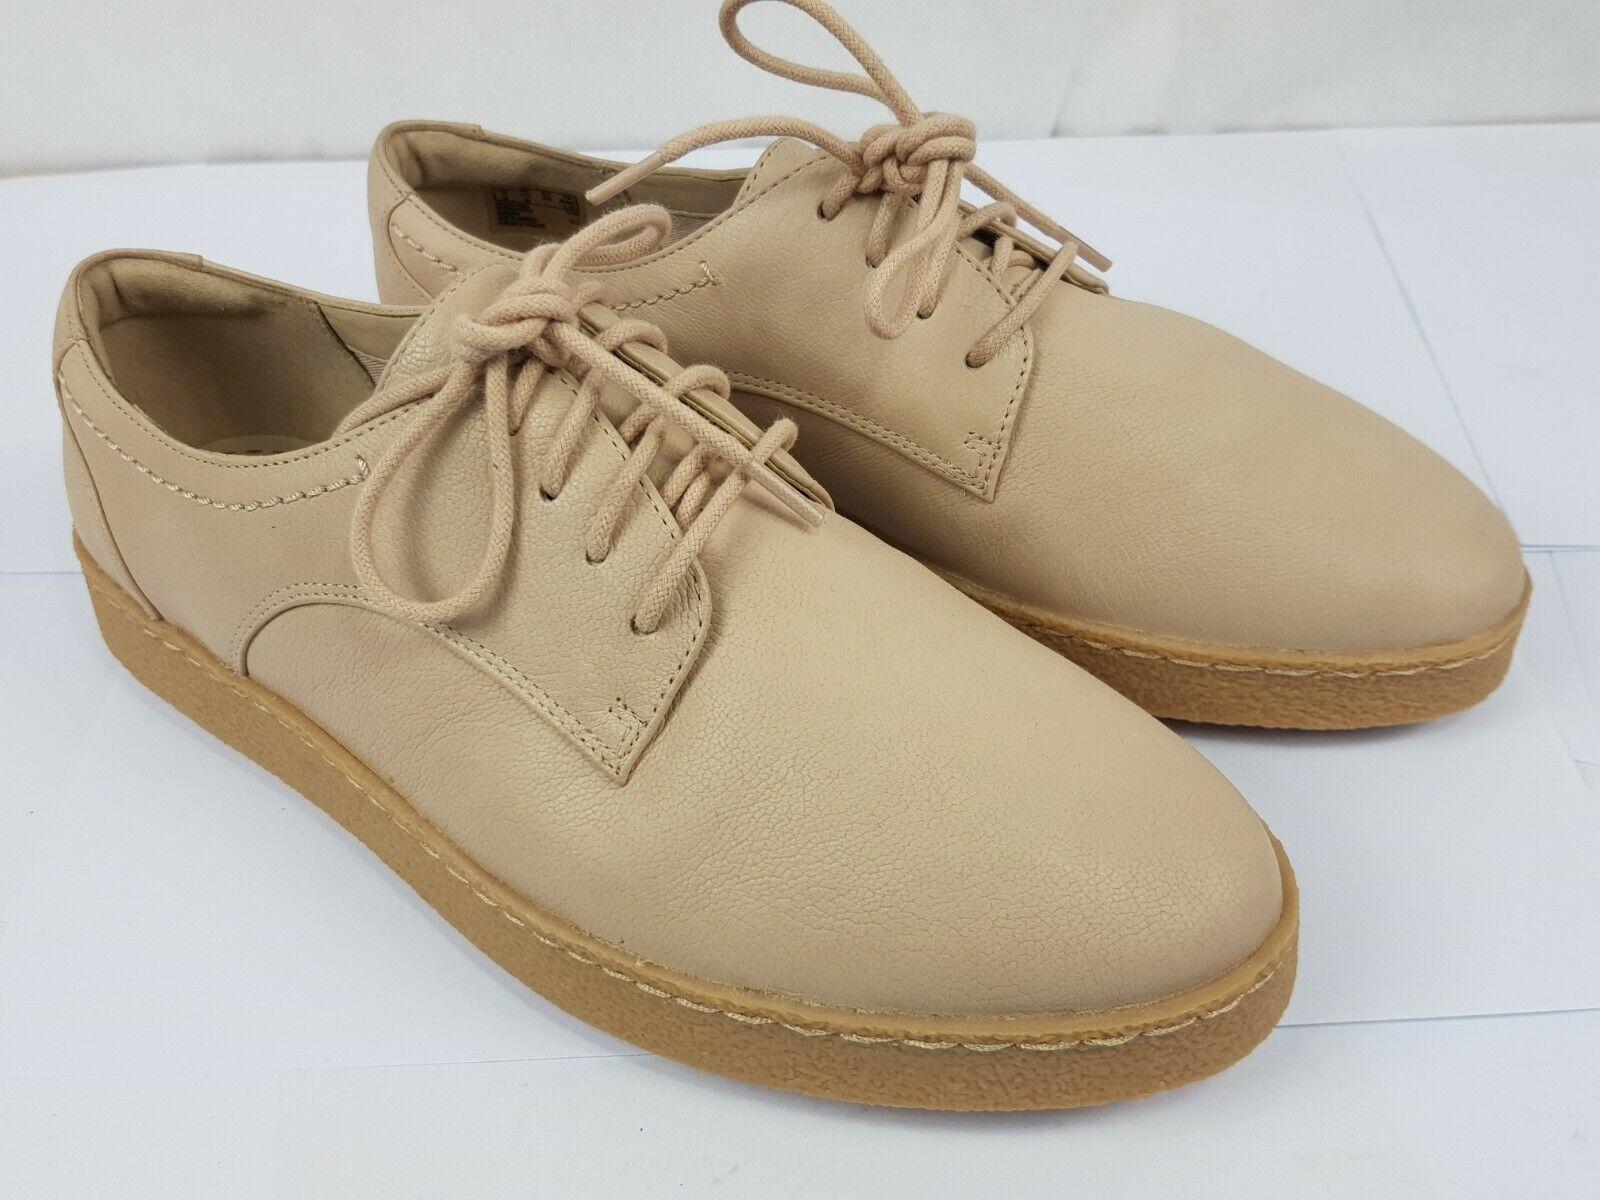 Clarks Pink Leather Womans Lace Up shoes Flats UK 5D Pre-worn Excellent Cond